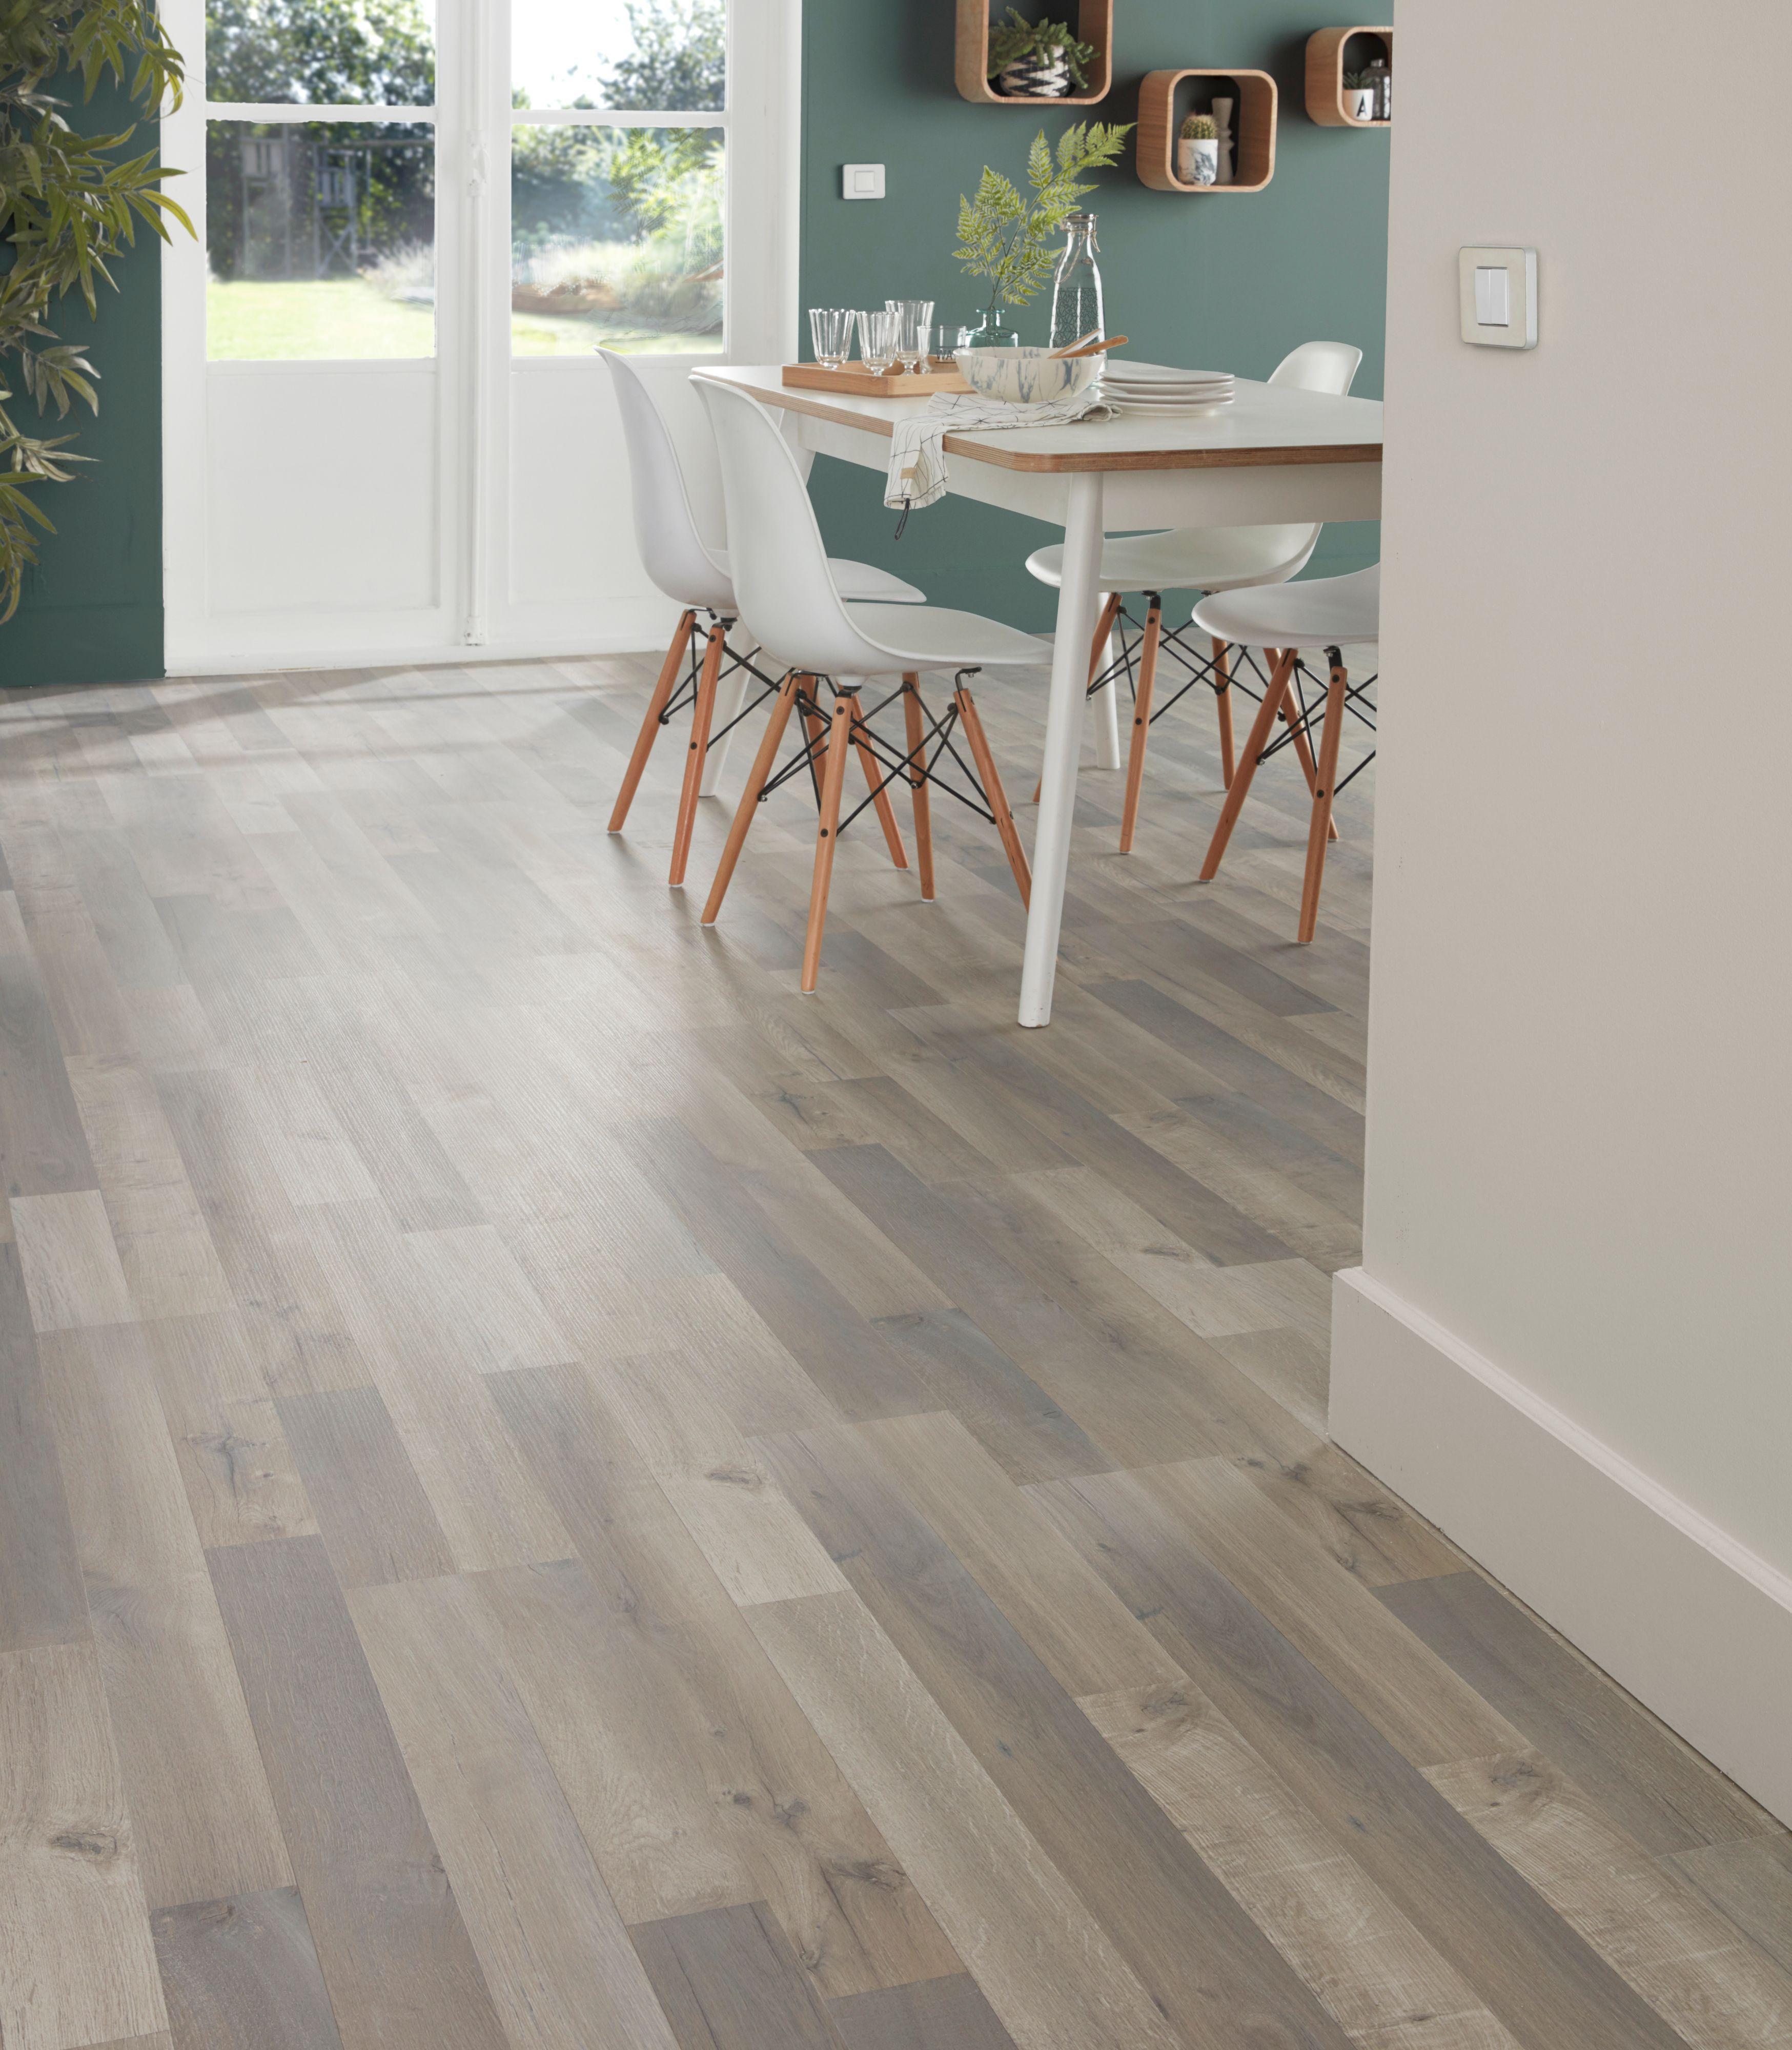 Addington Grey Oak Effect Laminate Flooring 1.996 m² Pack | Departments | DIY at B&Q